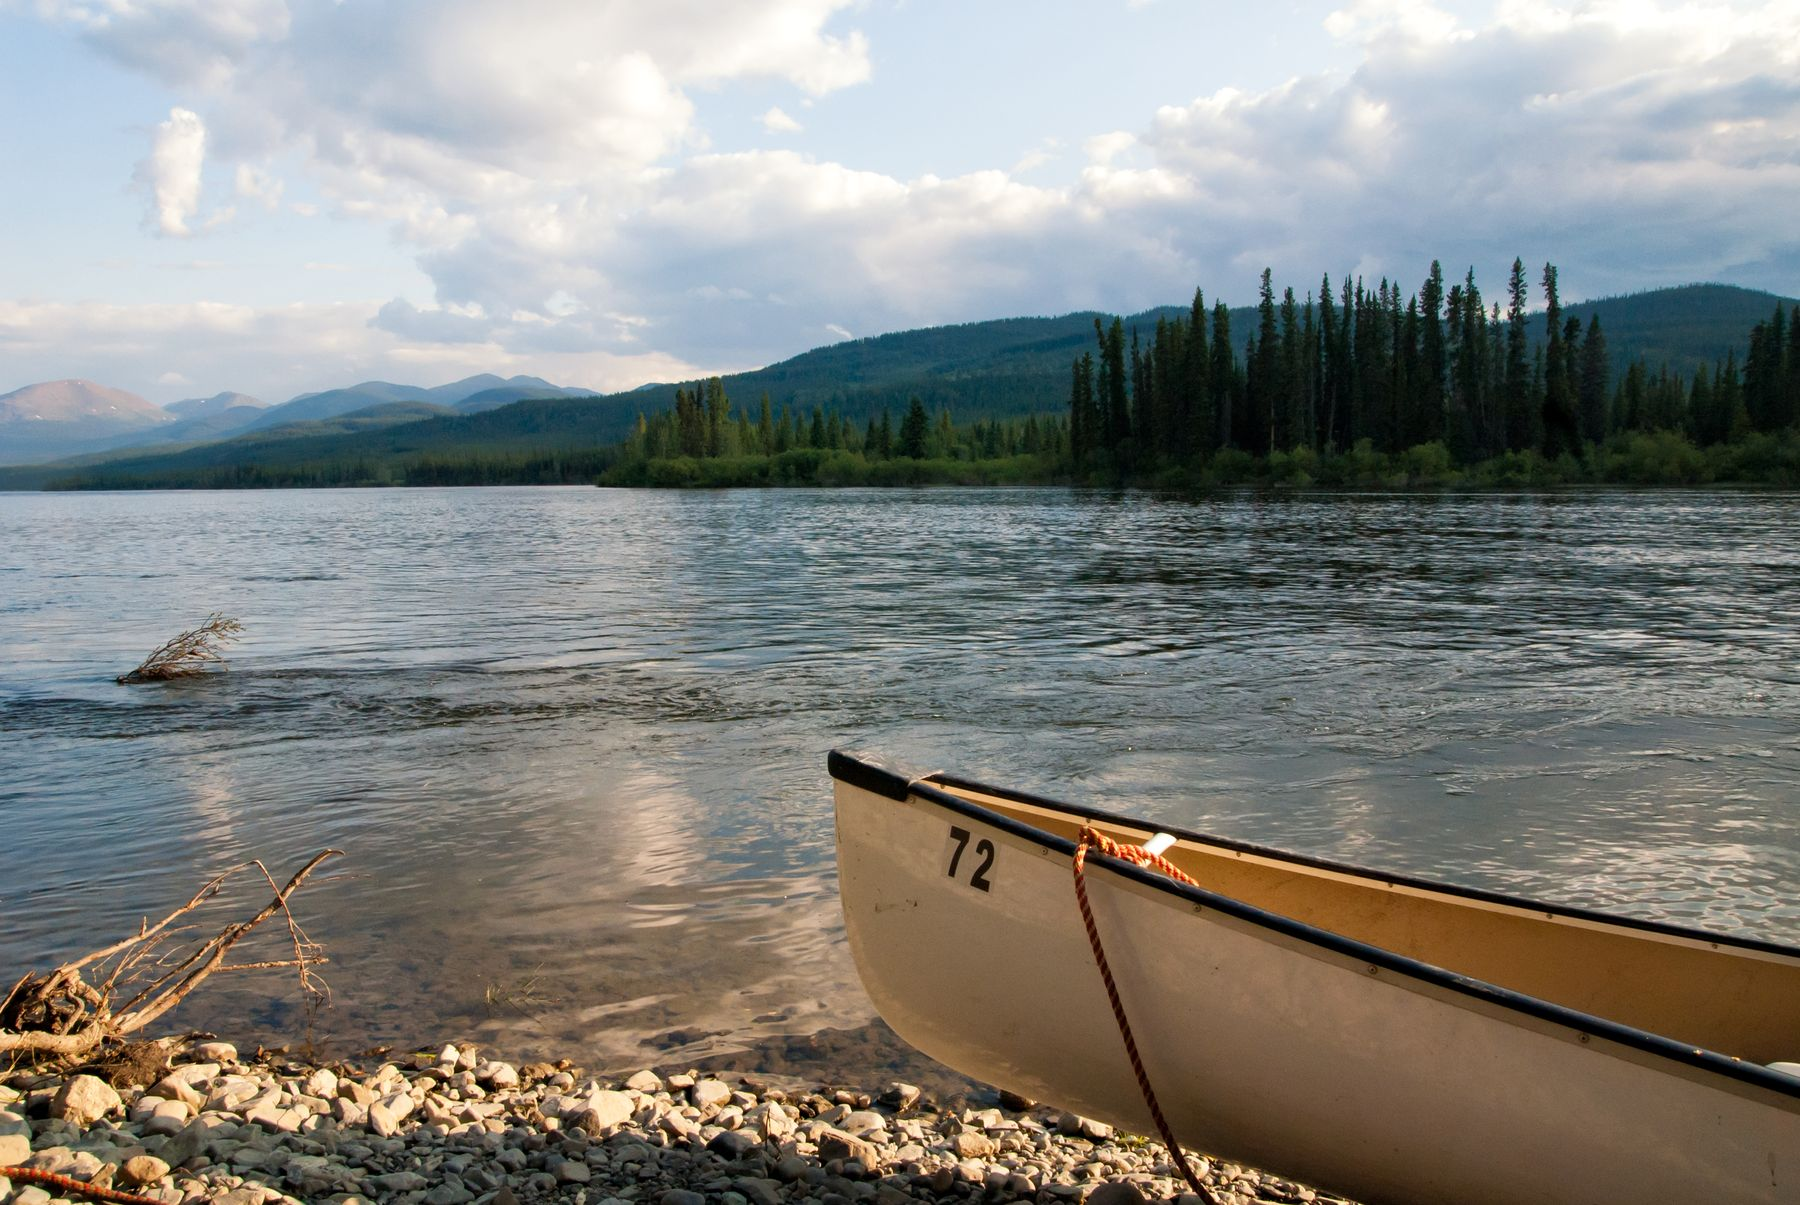 a canoe on the Yukon River